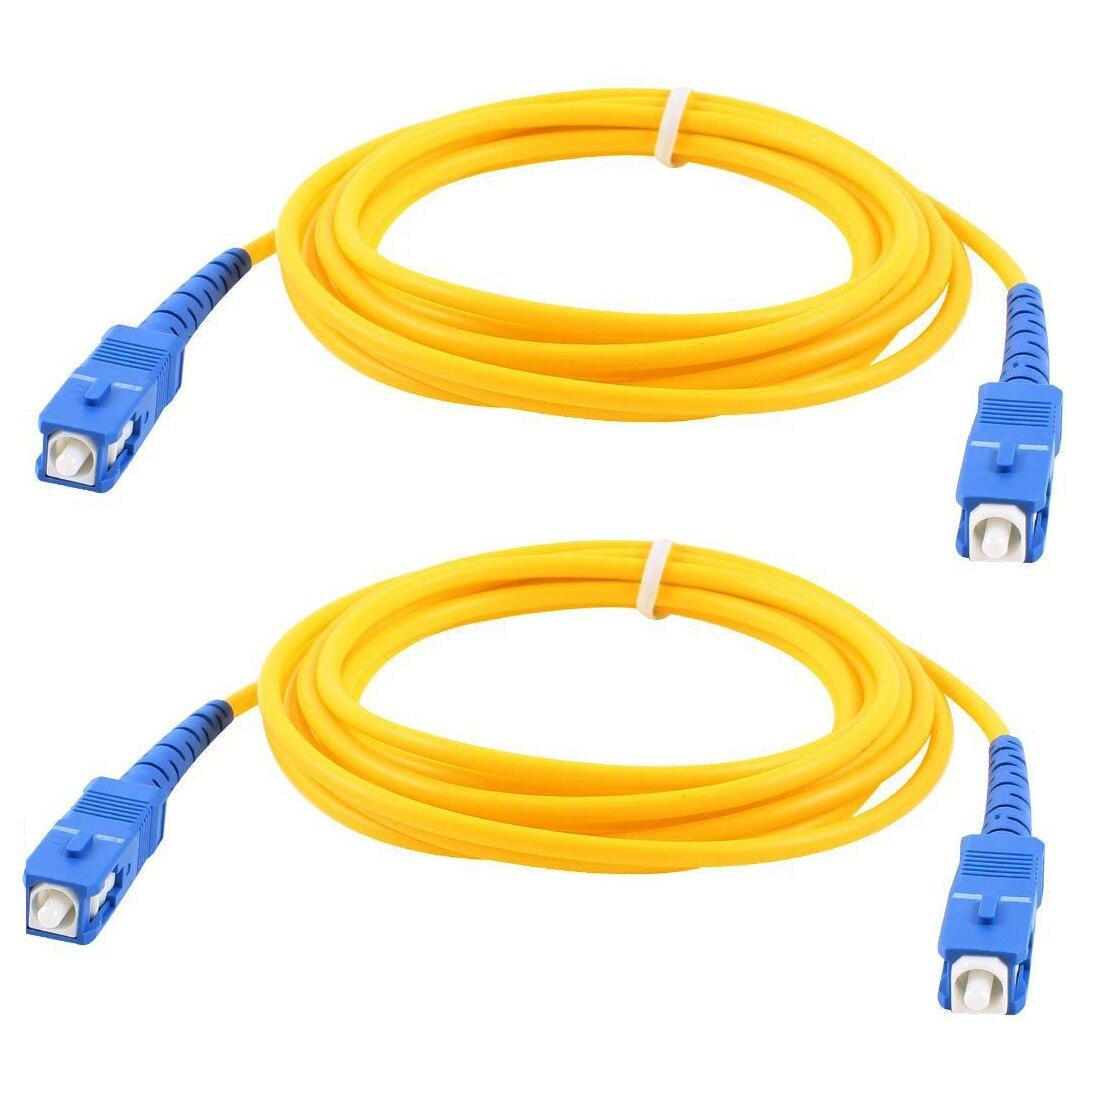 MAHA 2 Pcs Simplex Single Mode SC to SC Male Power Cable Fiber Optic Patch Yellow 2M